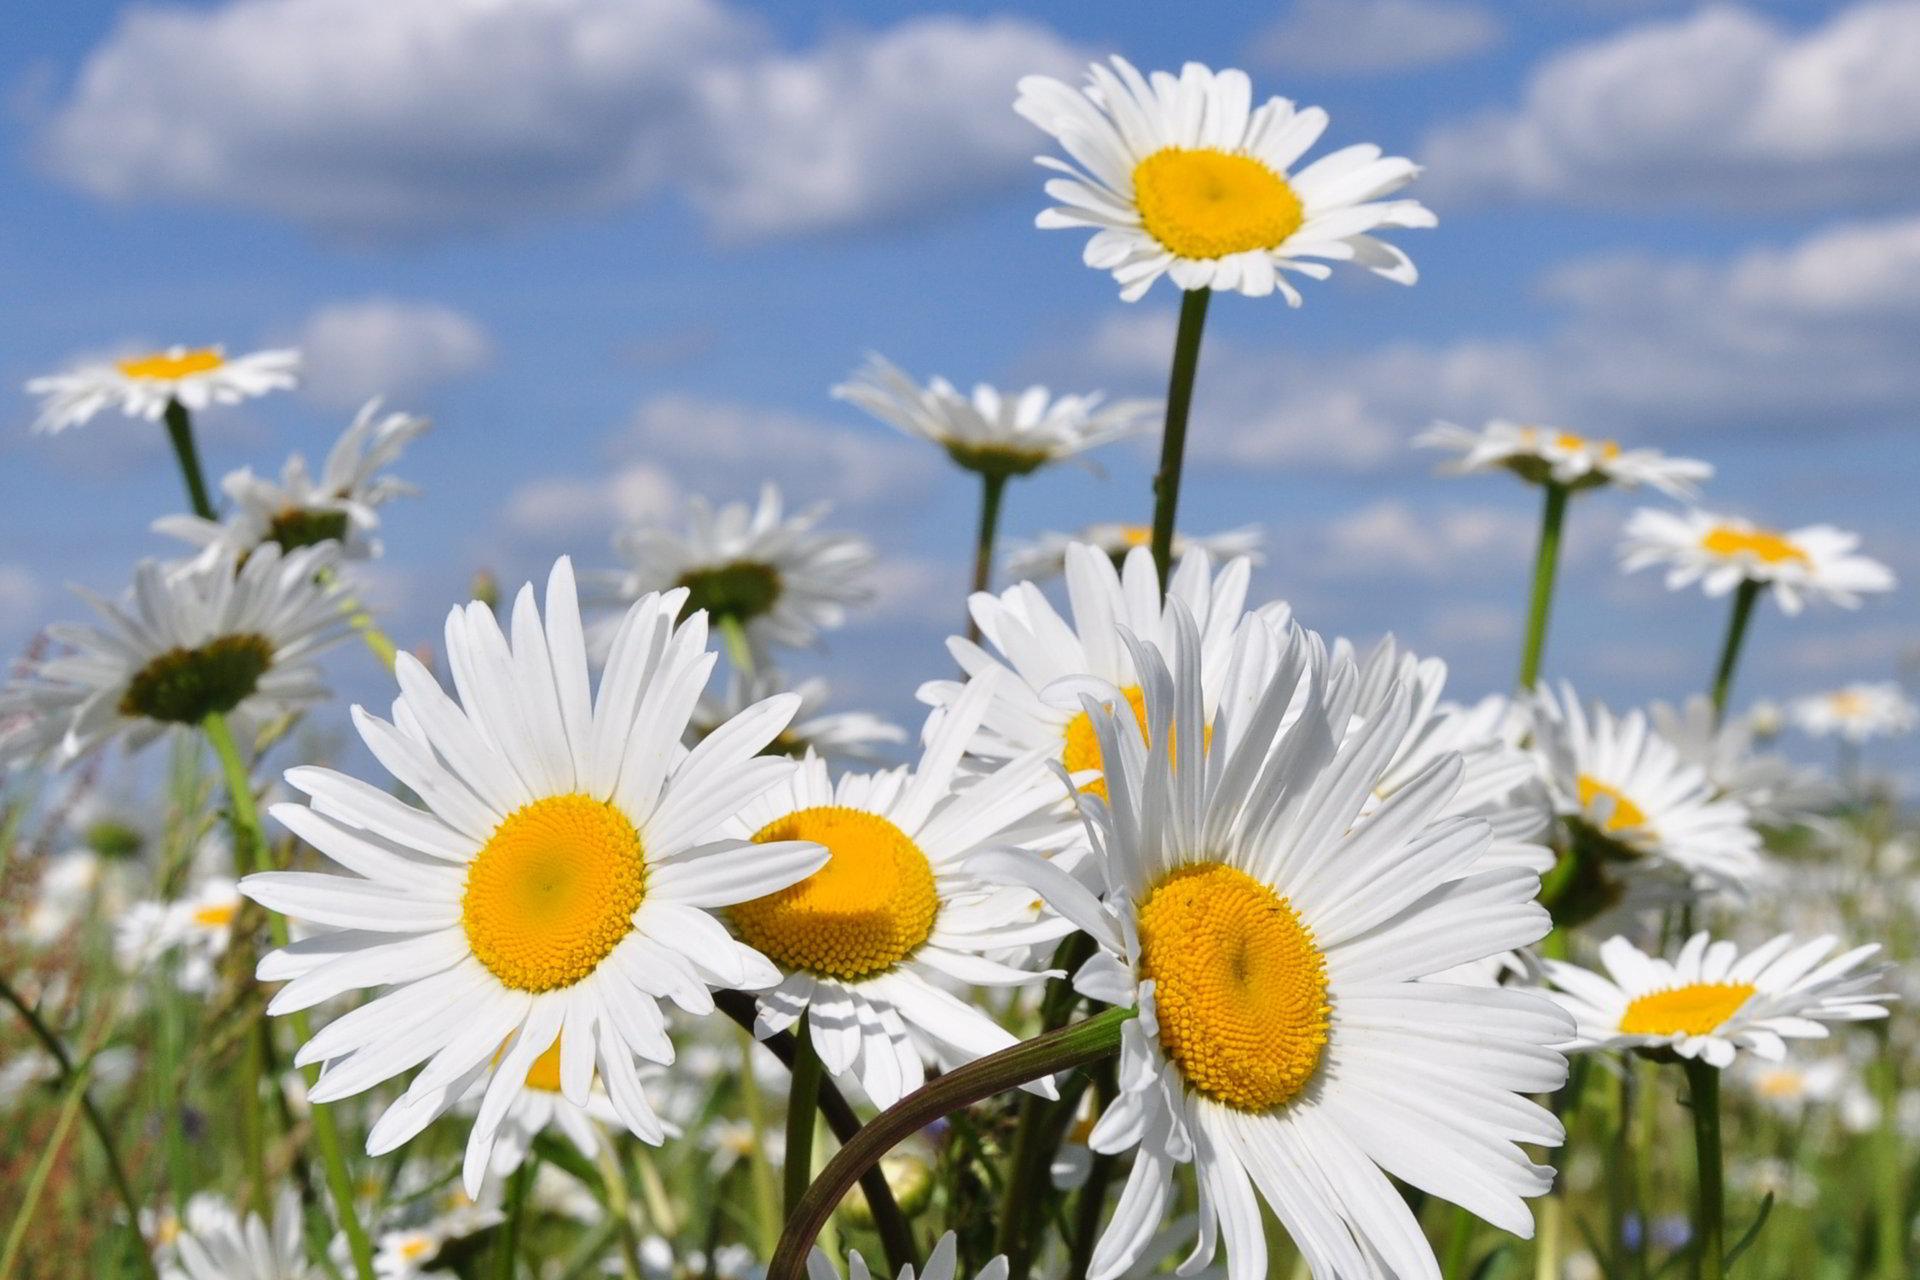 hinh anh hoa cuc dep 24